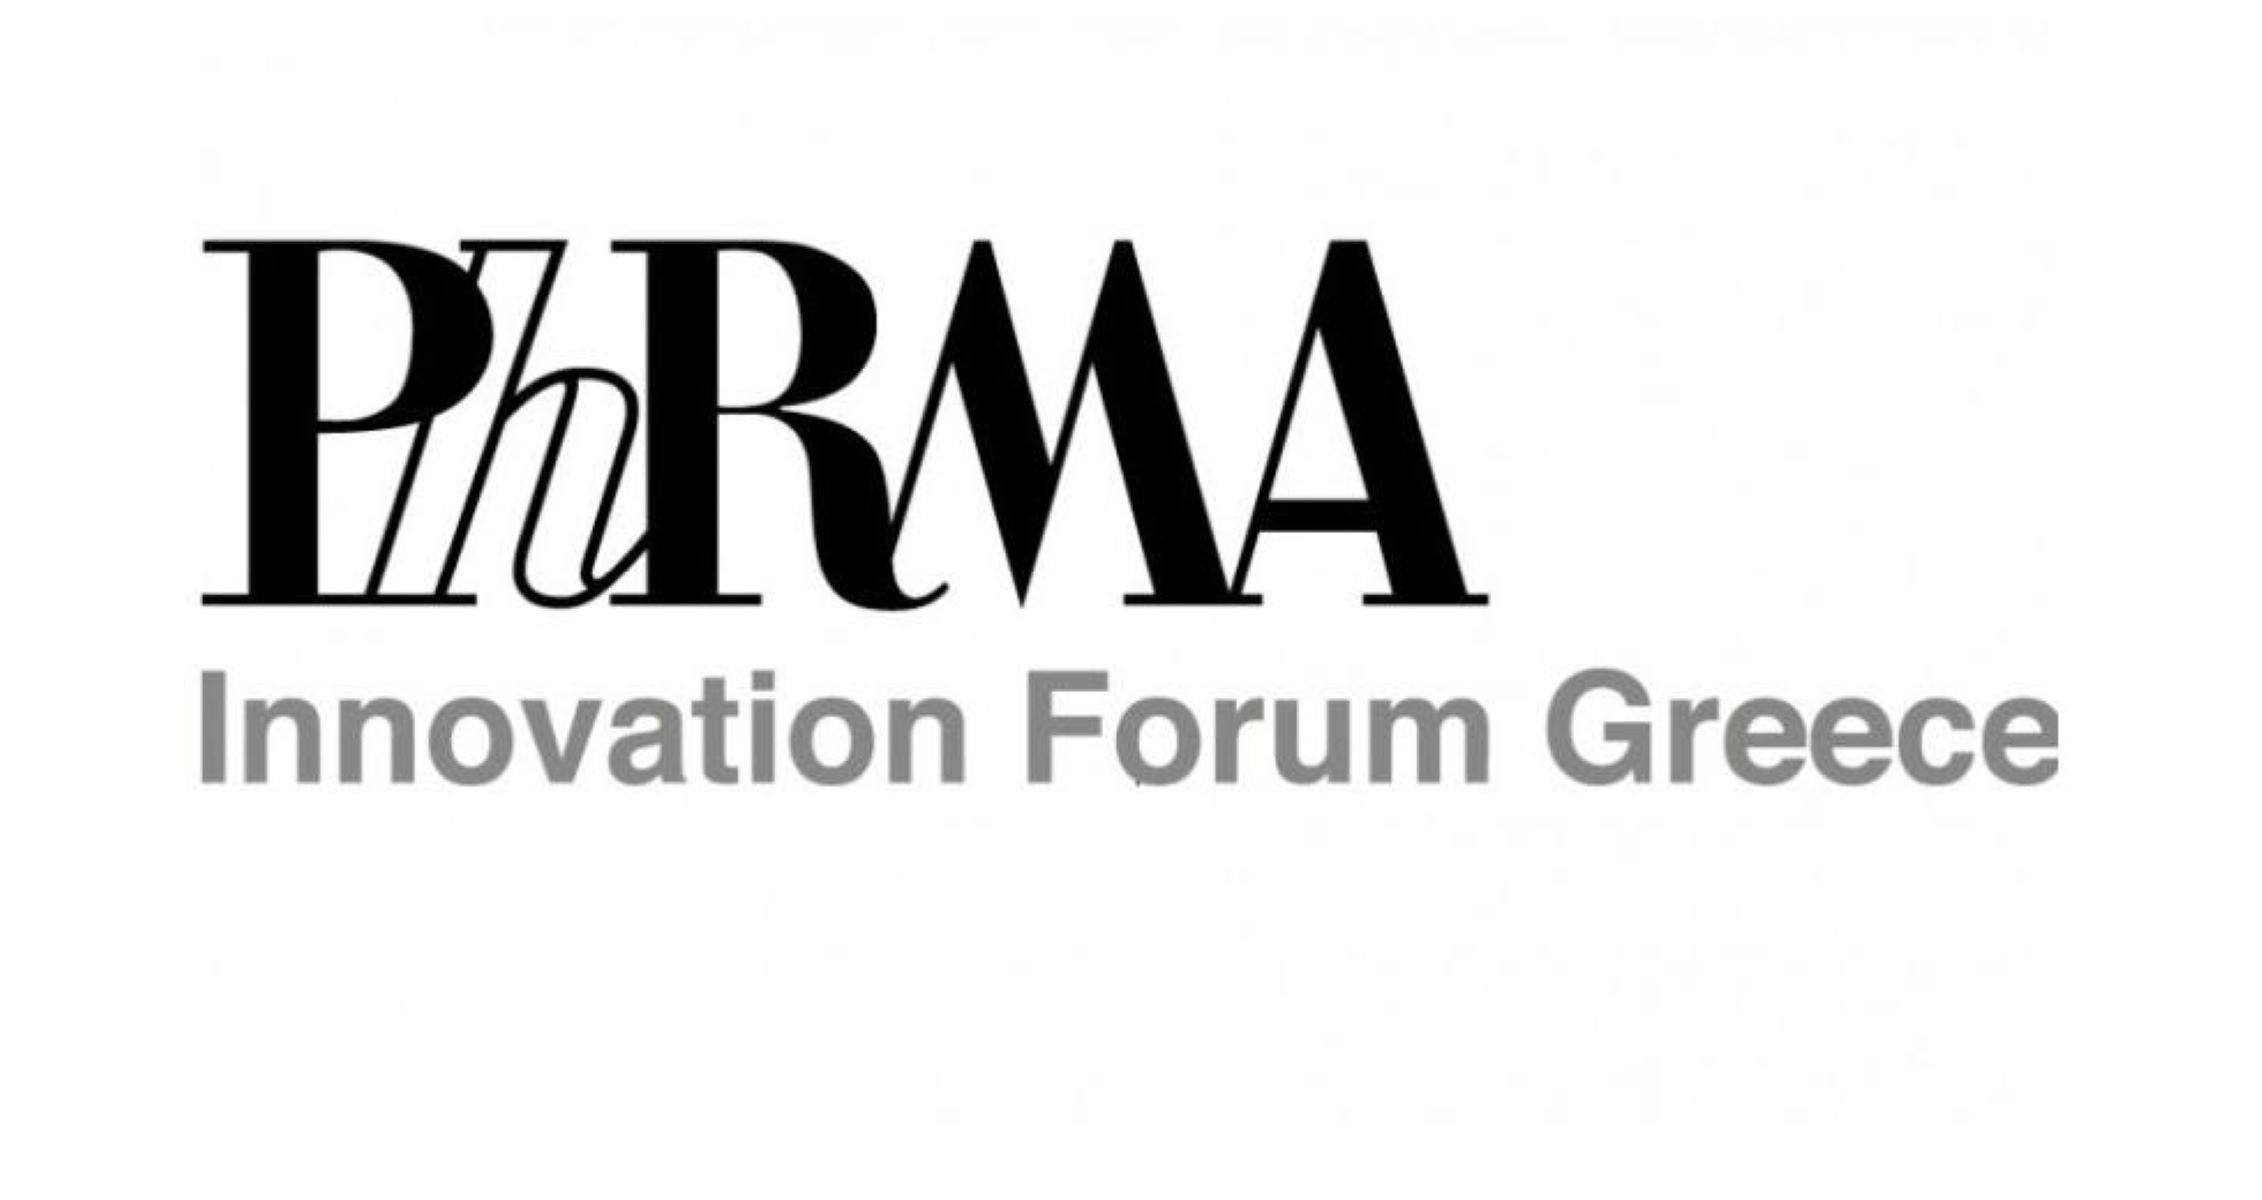 PhRMA Innovation Forum επιτροπή διαπραγμάτευσης φαρμάκων: Δέσμευση για αξιολόγηση μέχρι 8 μήνες